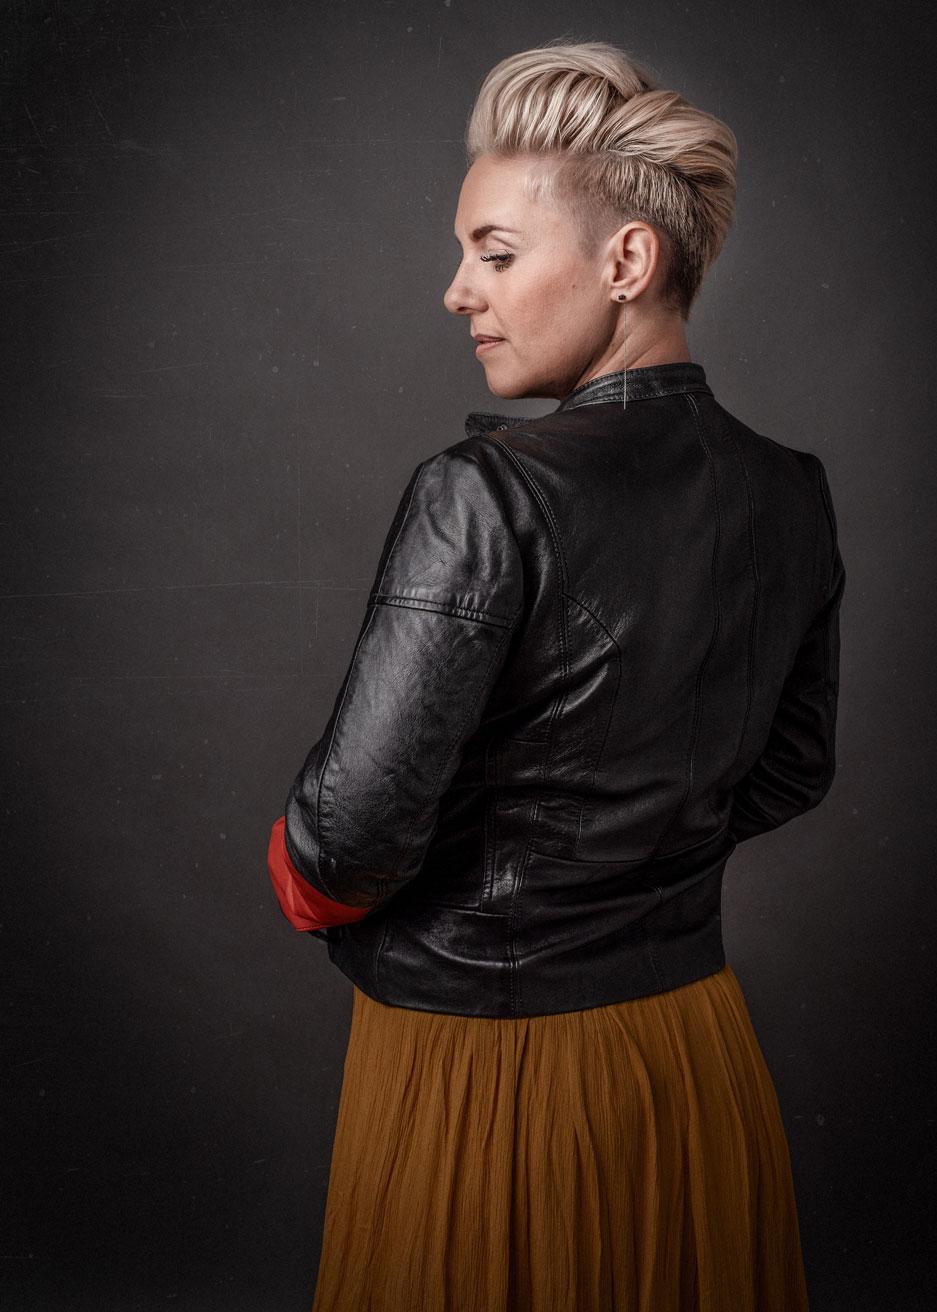 barbara_macferrin_photography_boulder_colorado_80303_fine_art_women_leather_jacket_edgy.jpg